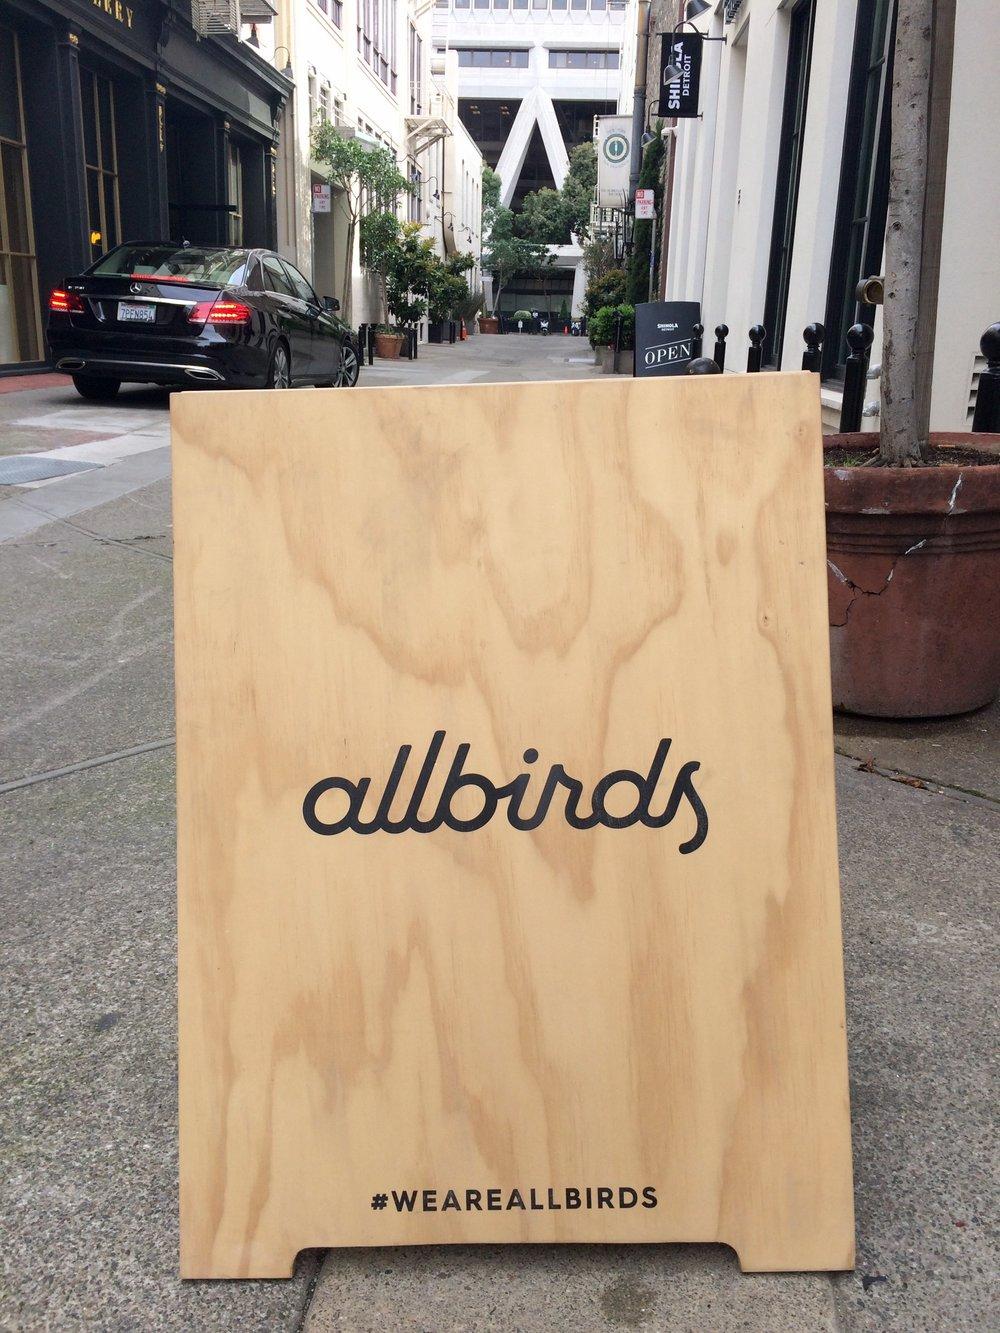 The Allbirds sign in downtown San Francisco, photo courtesy of Natasa Spasic